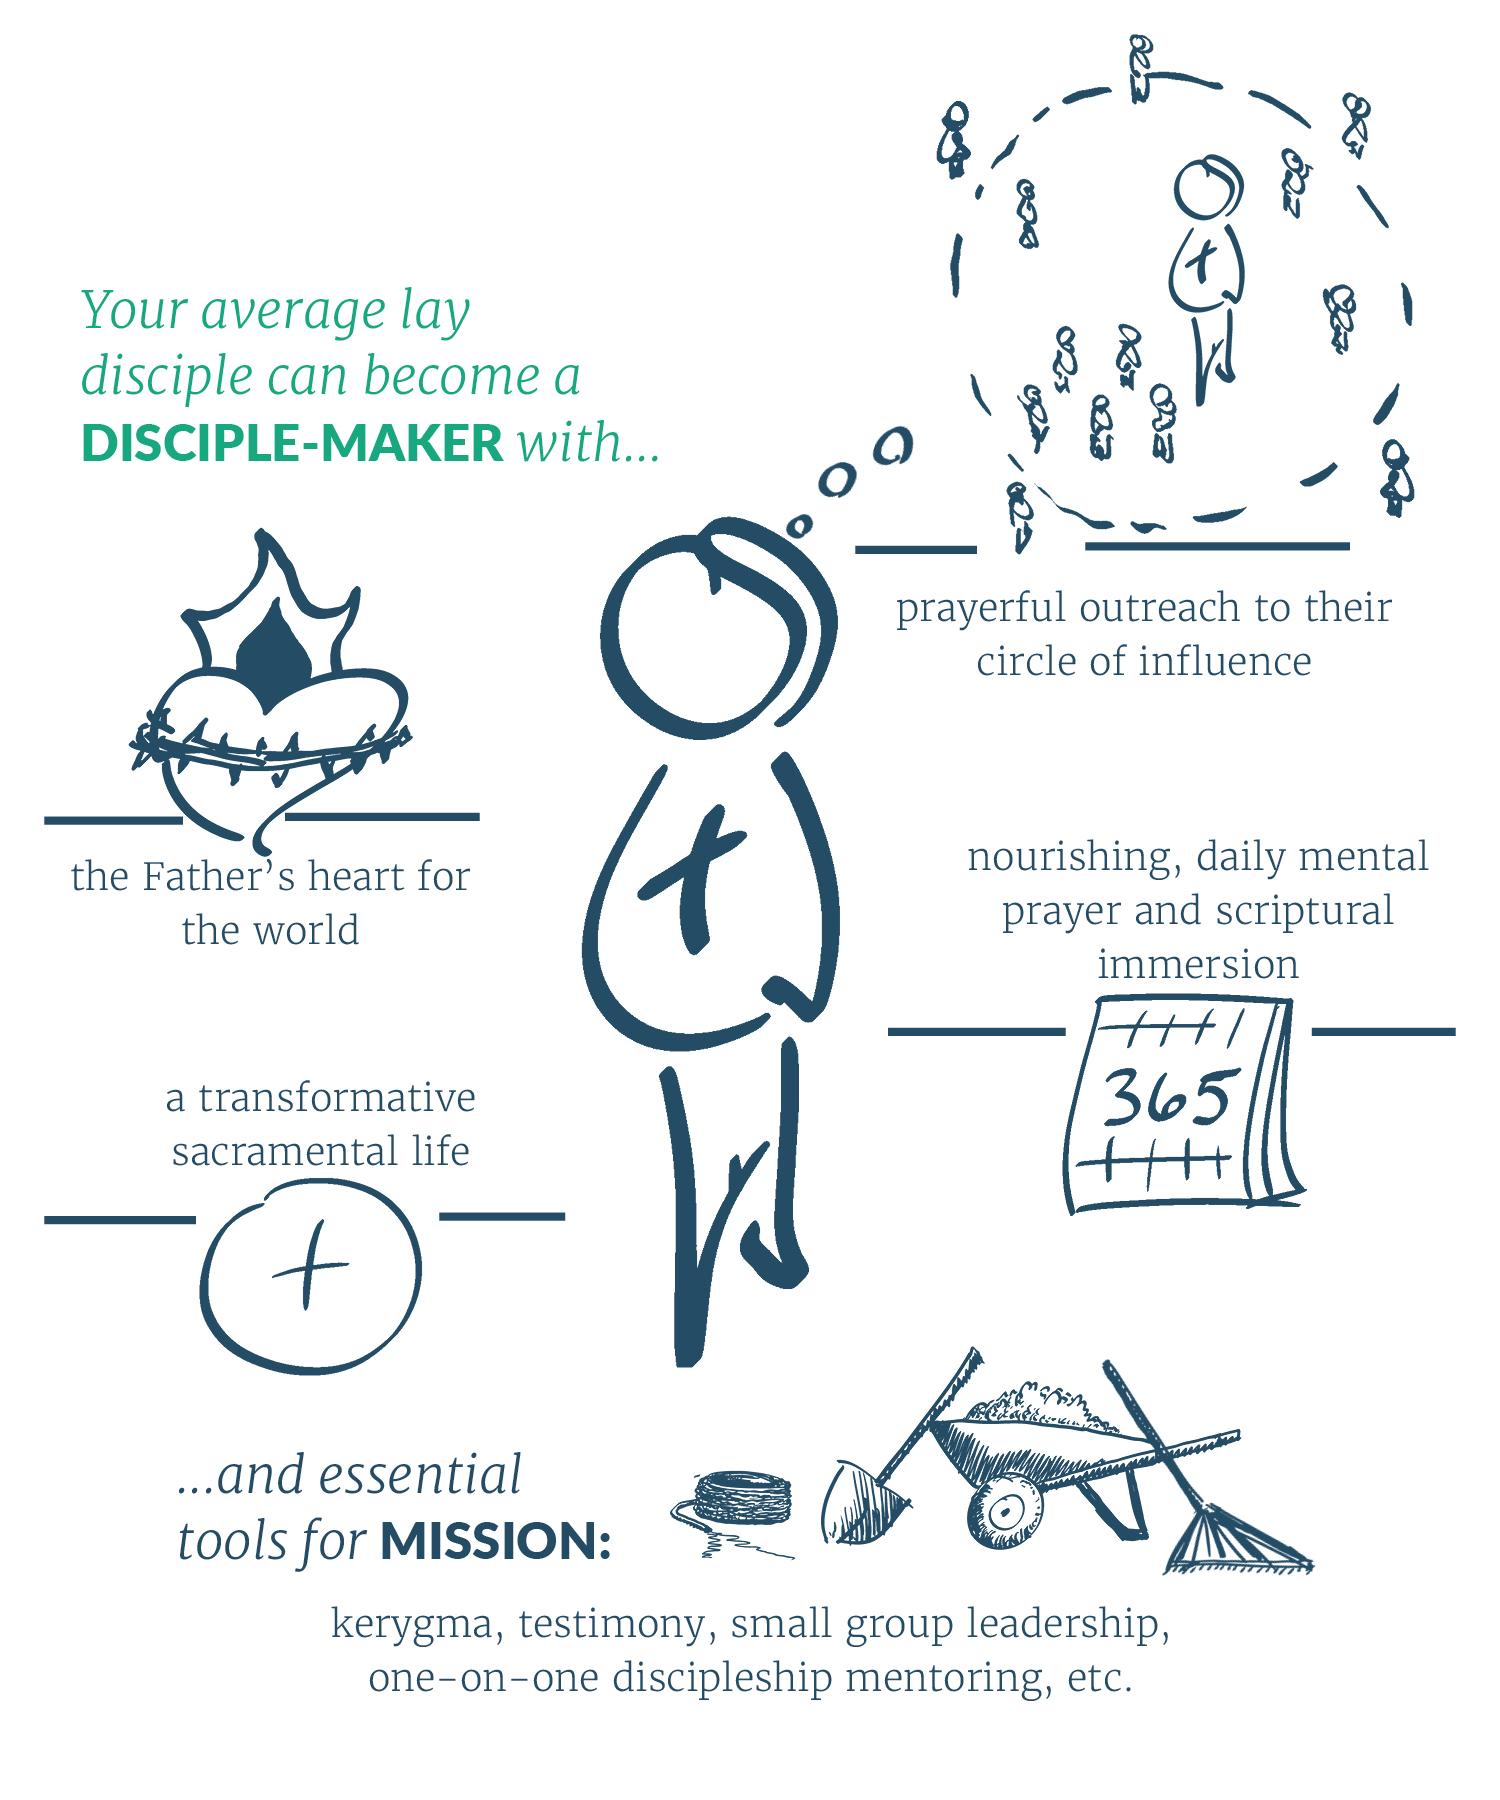 Description of the Lay Disciple-Maker